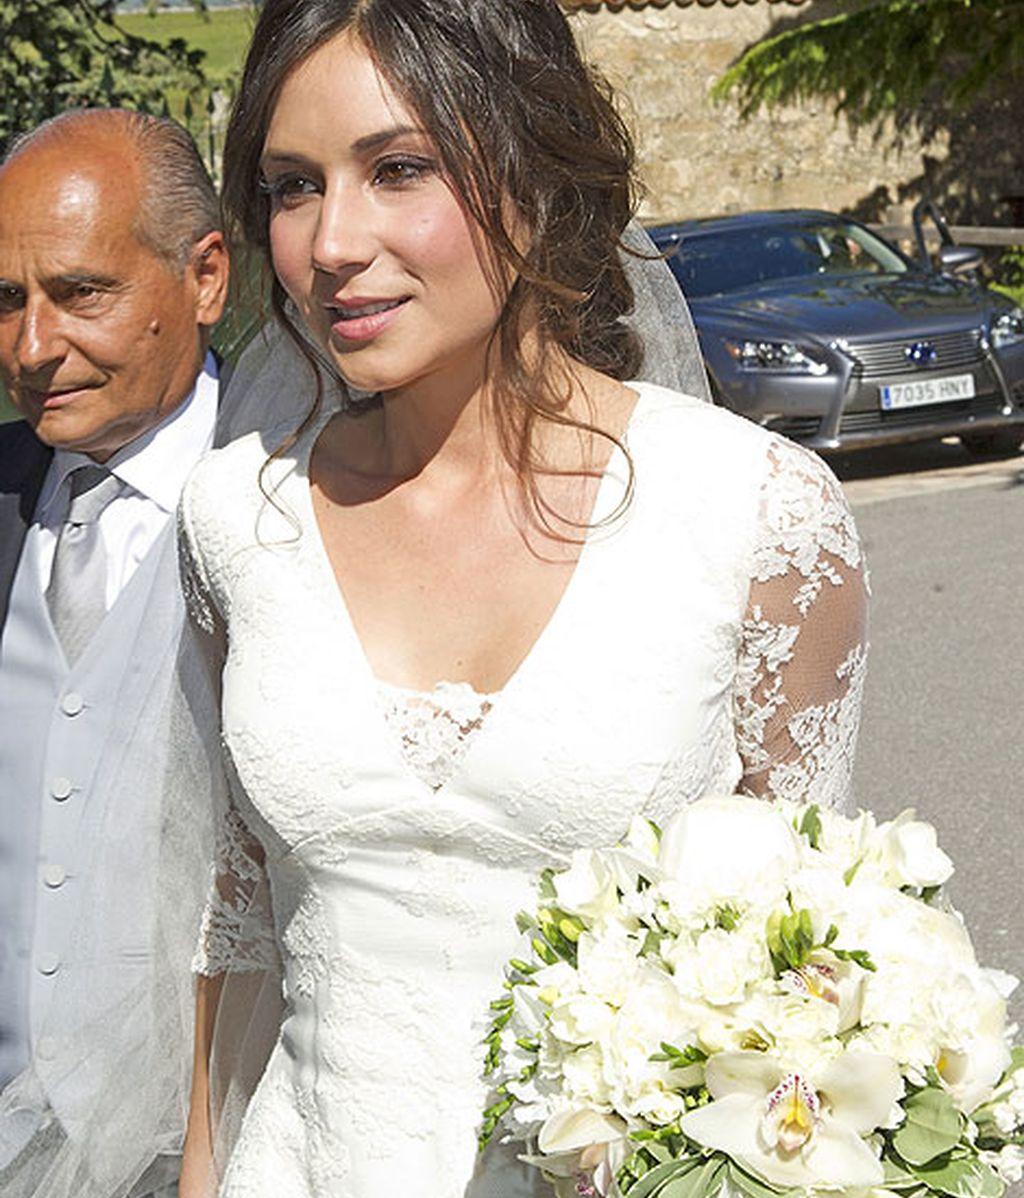 La novia, Cristina Sainz, lució un vestido con escote en pici